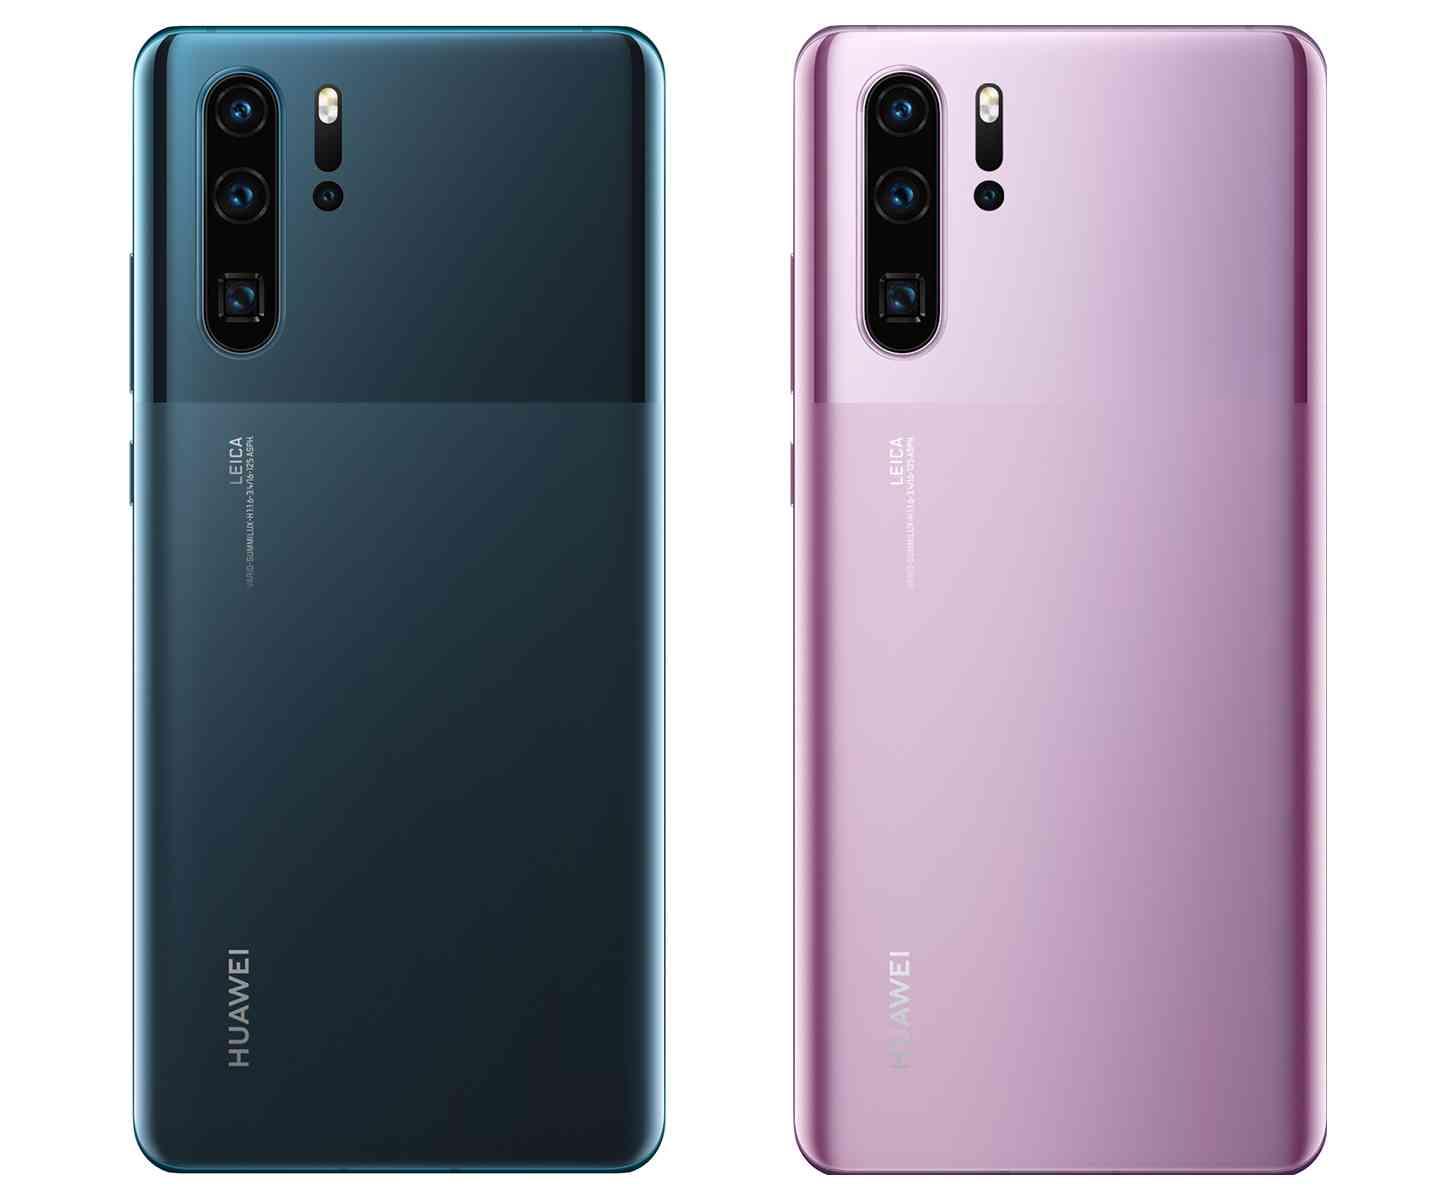 Huawei new P30 Pro dual finish